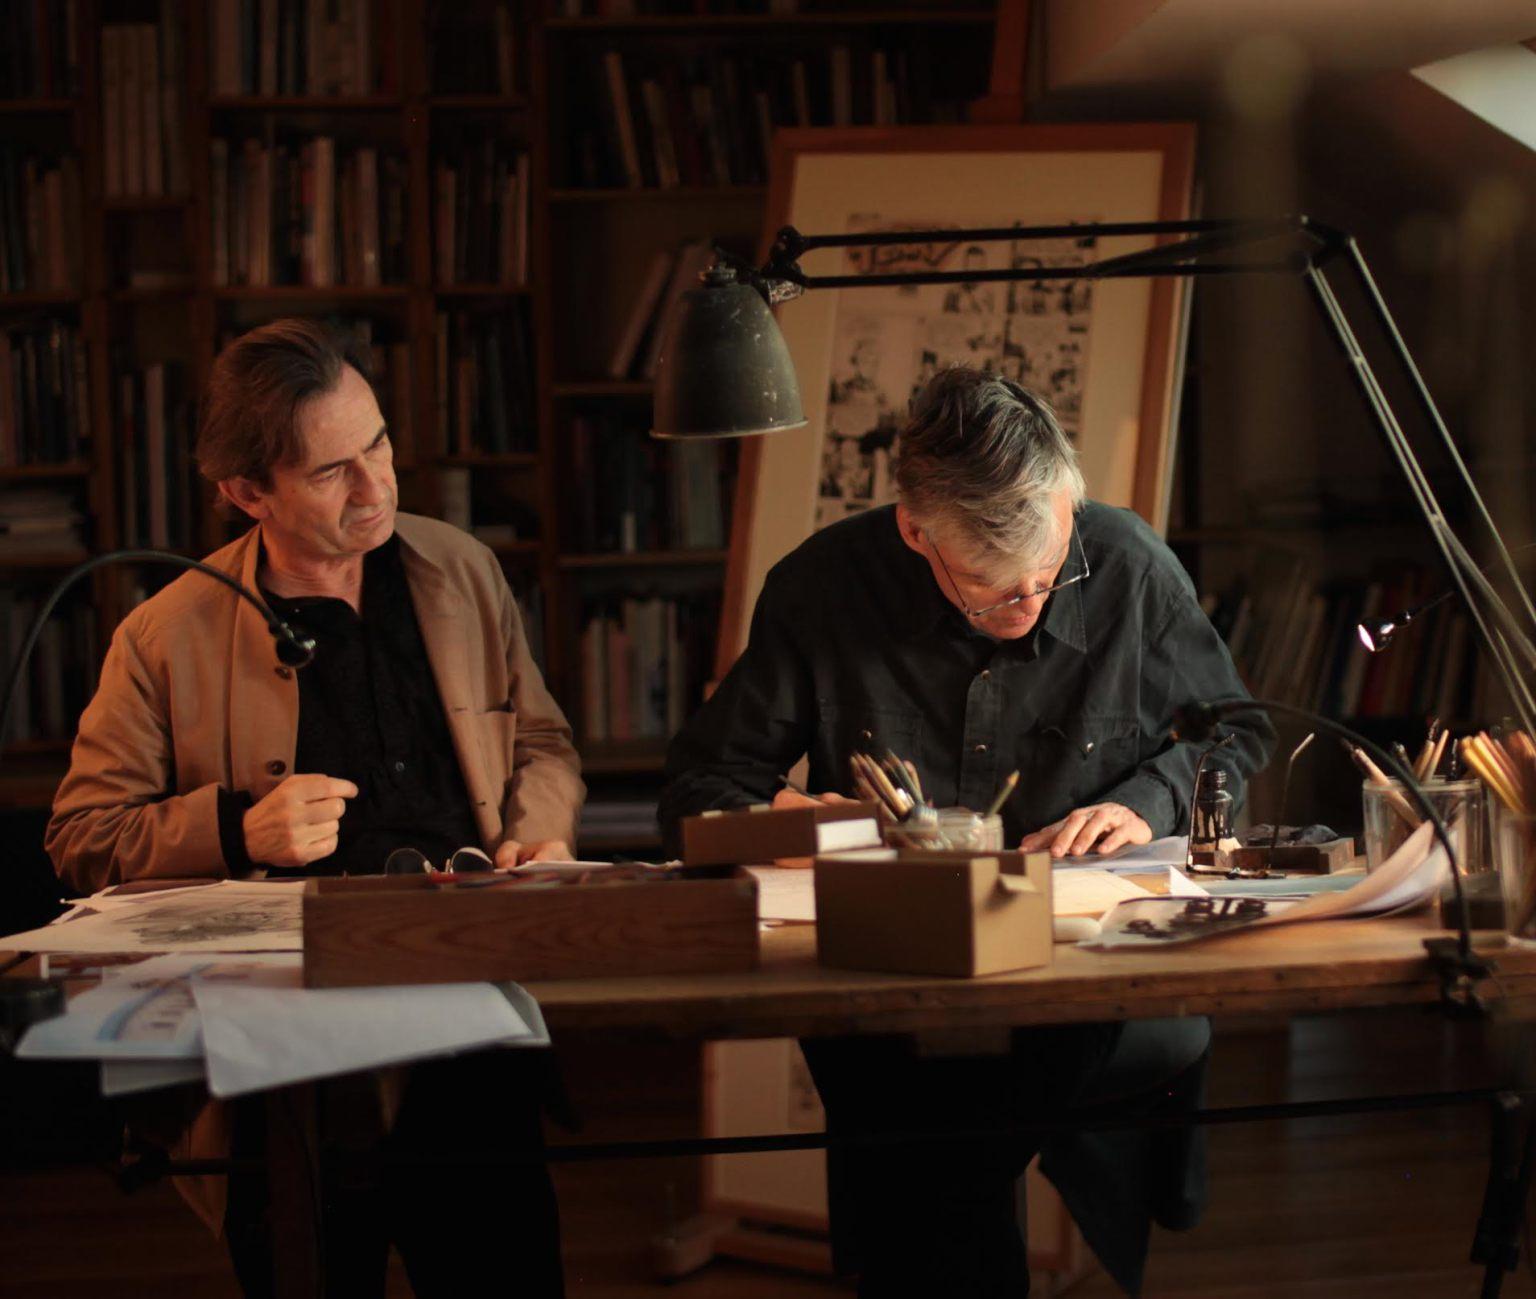 François Schuiten et Benoît Peeters au travail. Photo: Vladimir Peeters